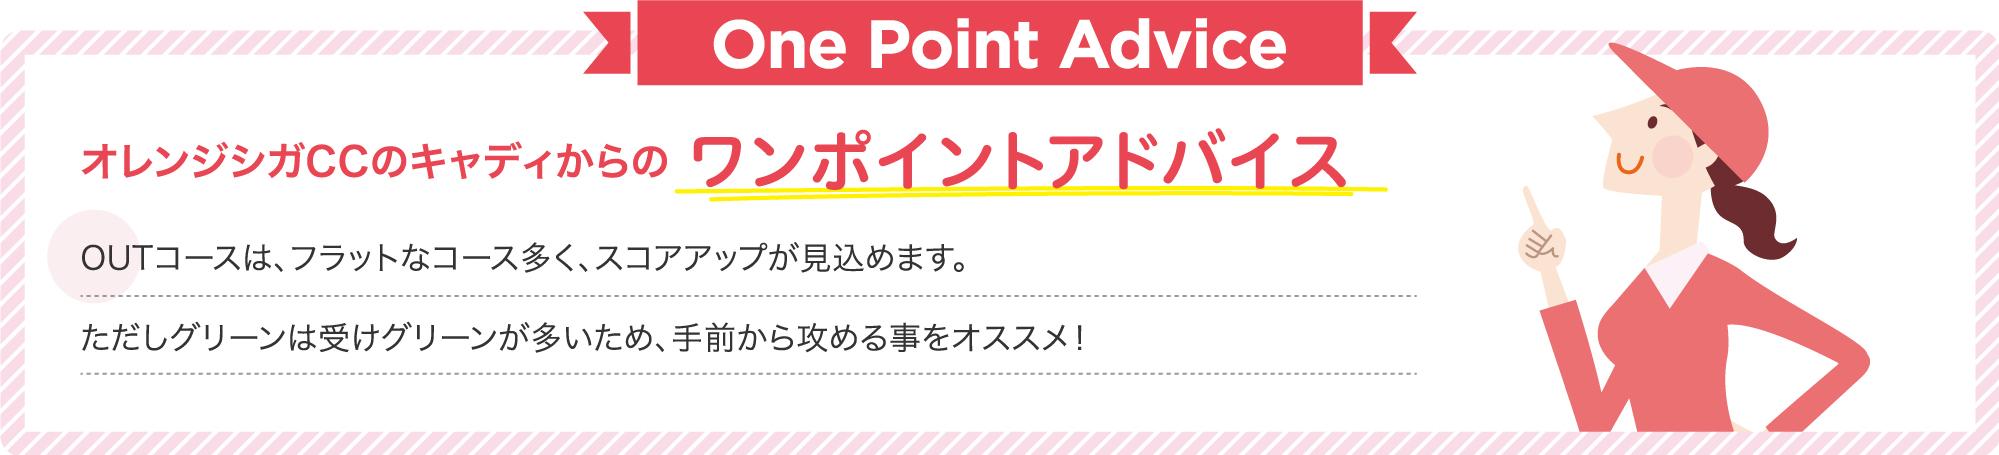 One Point Advice